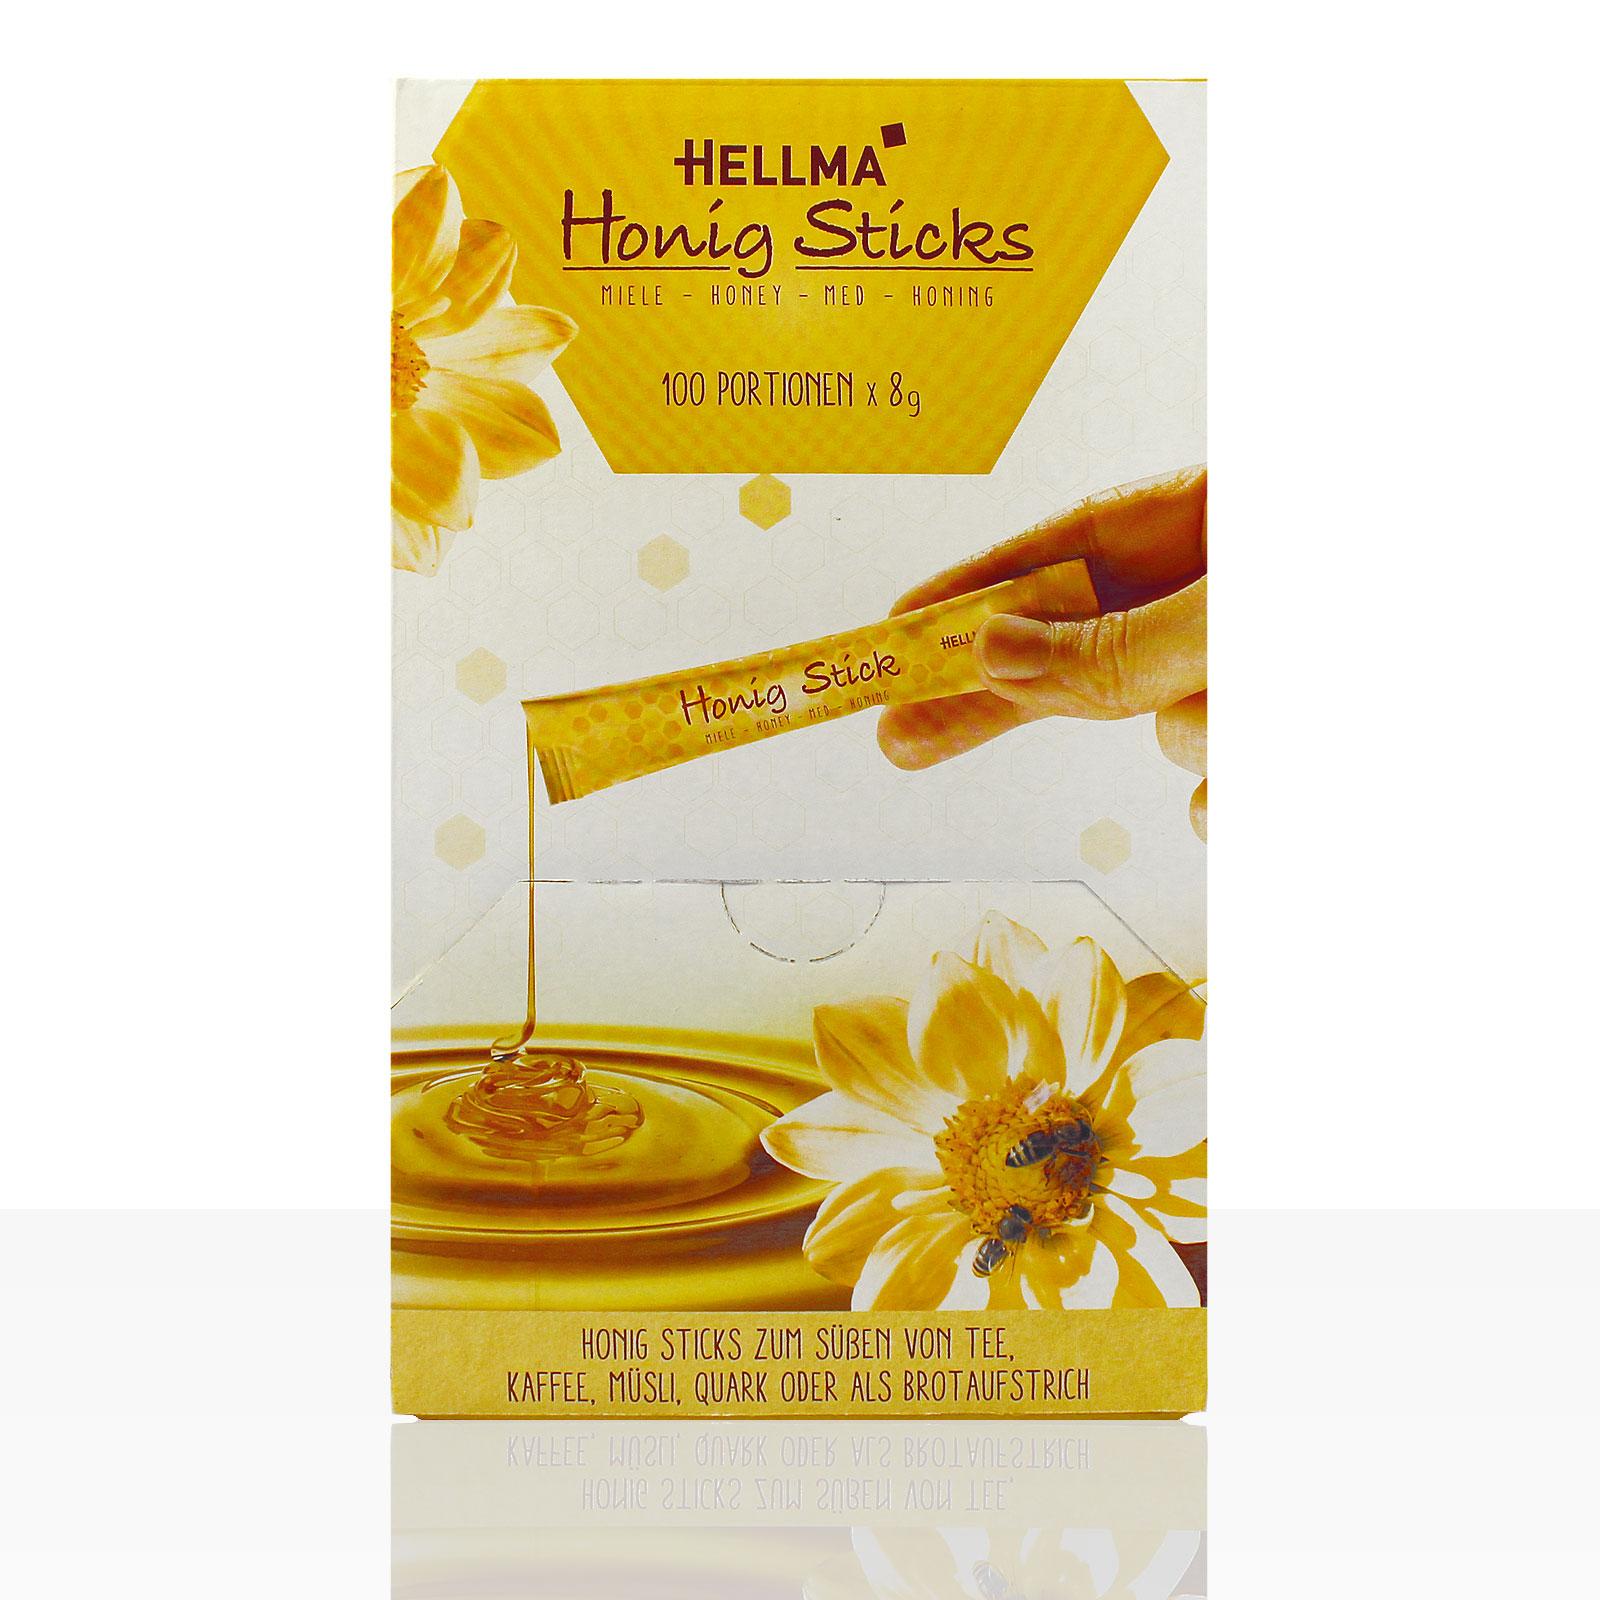 Hellma Honig-Sticks 100 x 8g